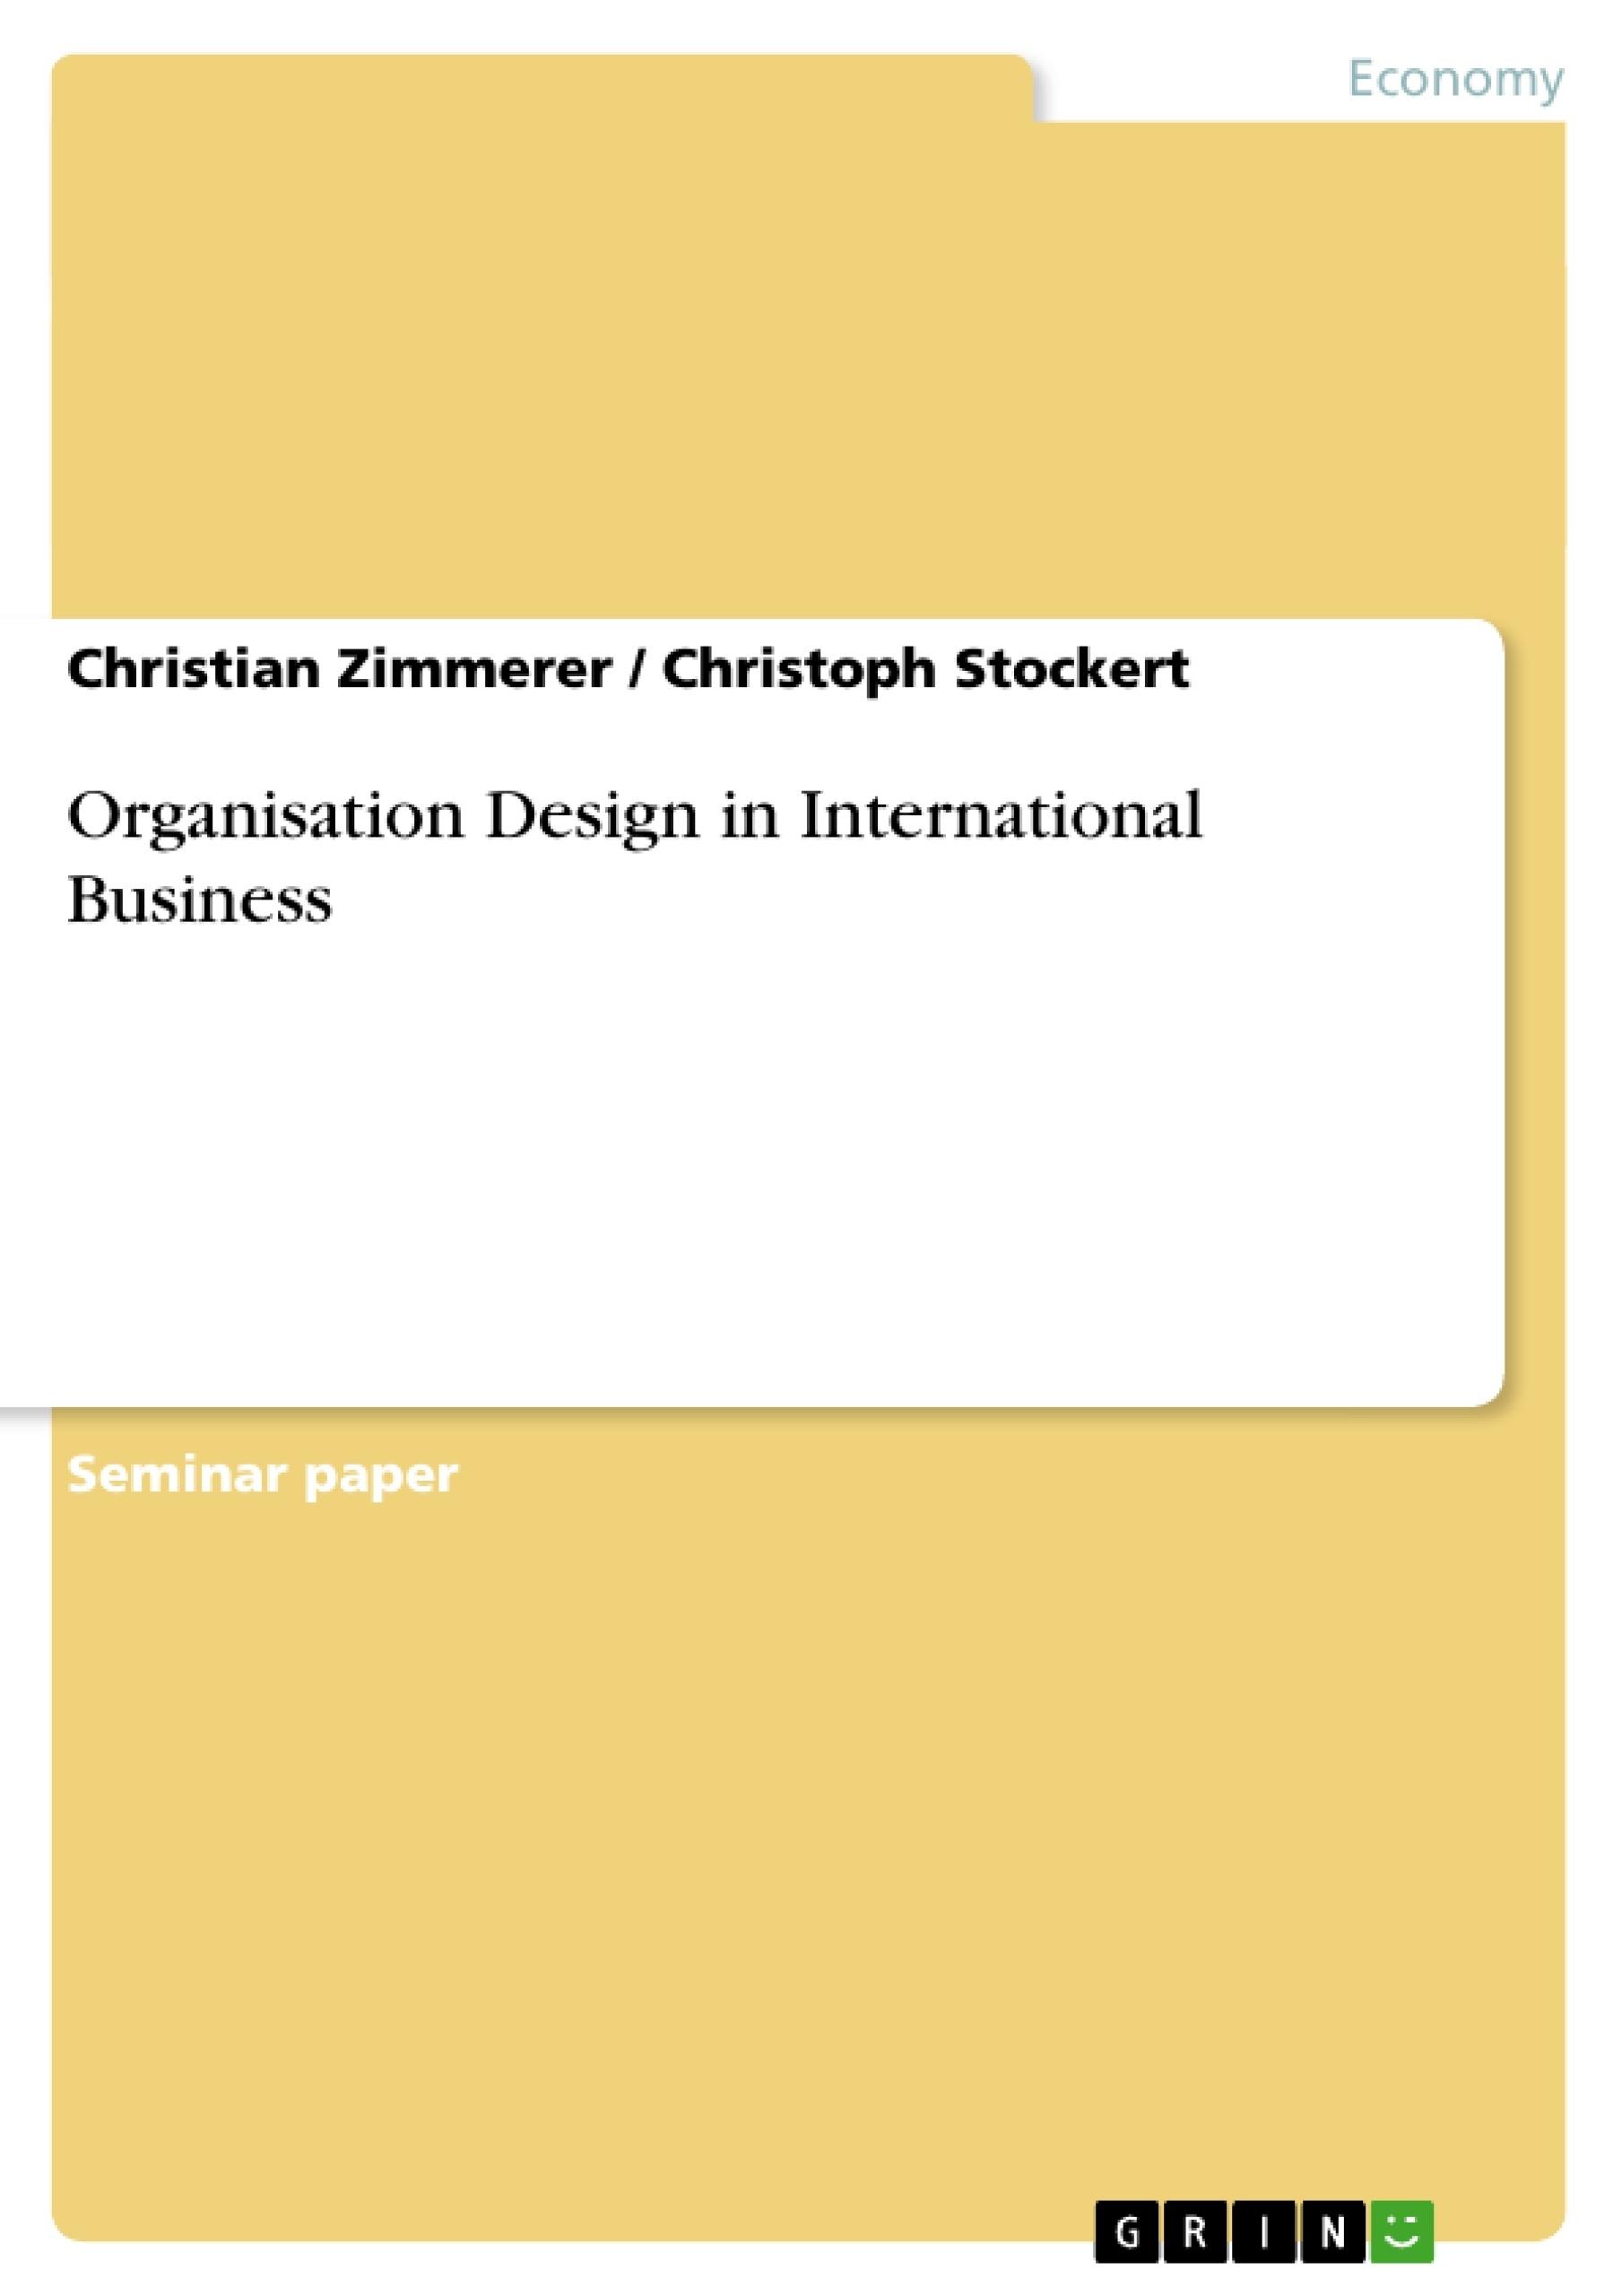 Title: Organisation Design in International Business